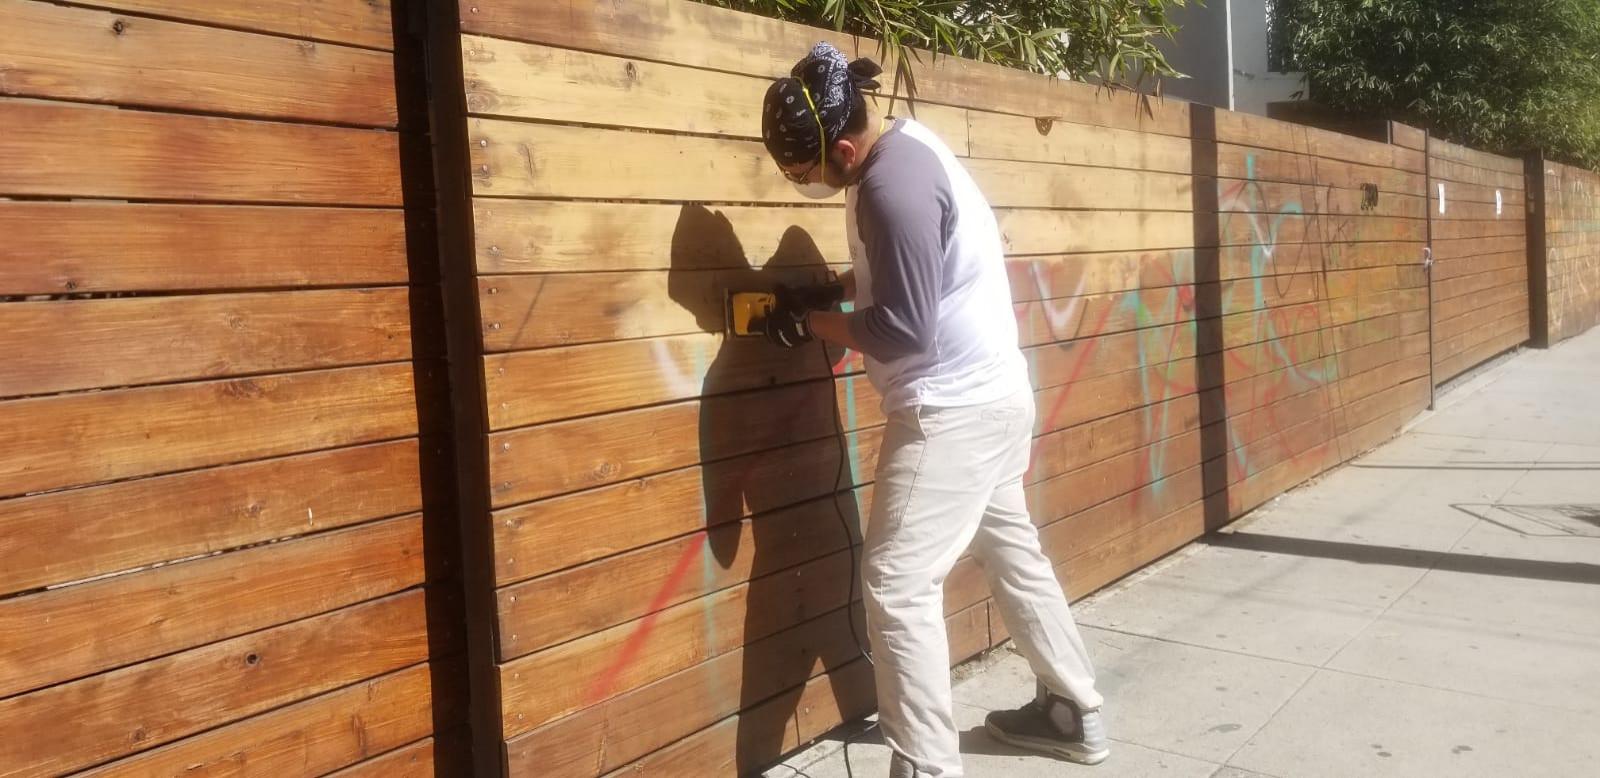 Graffiti Wall-Highland Park